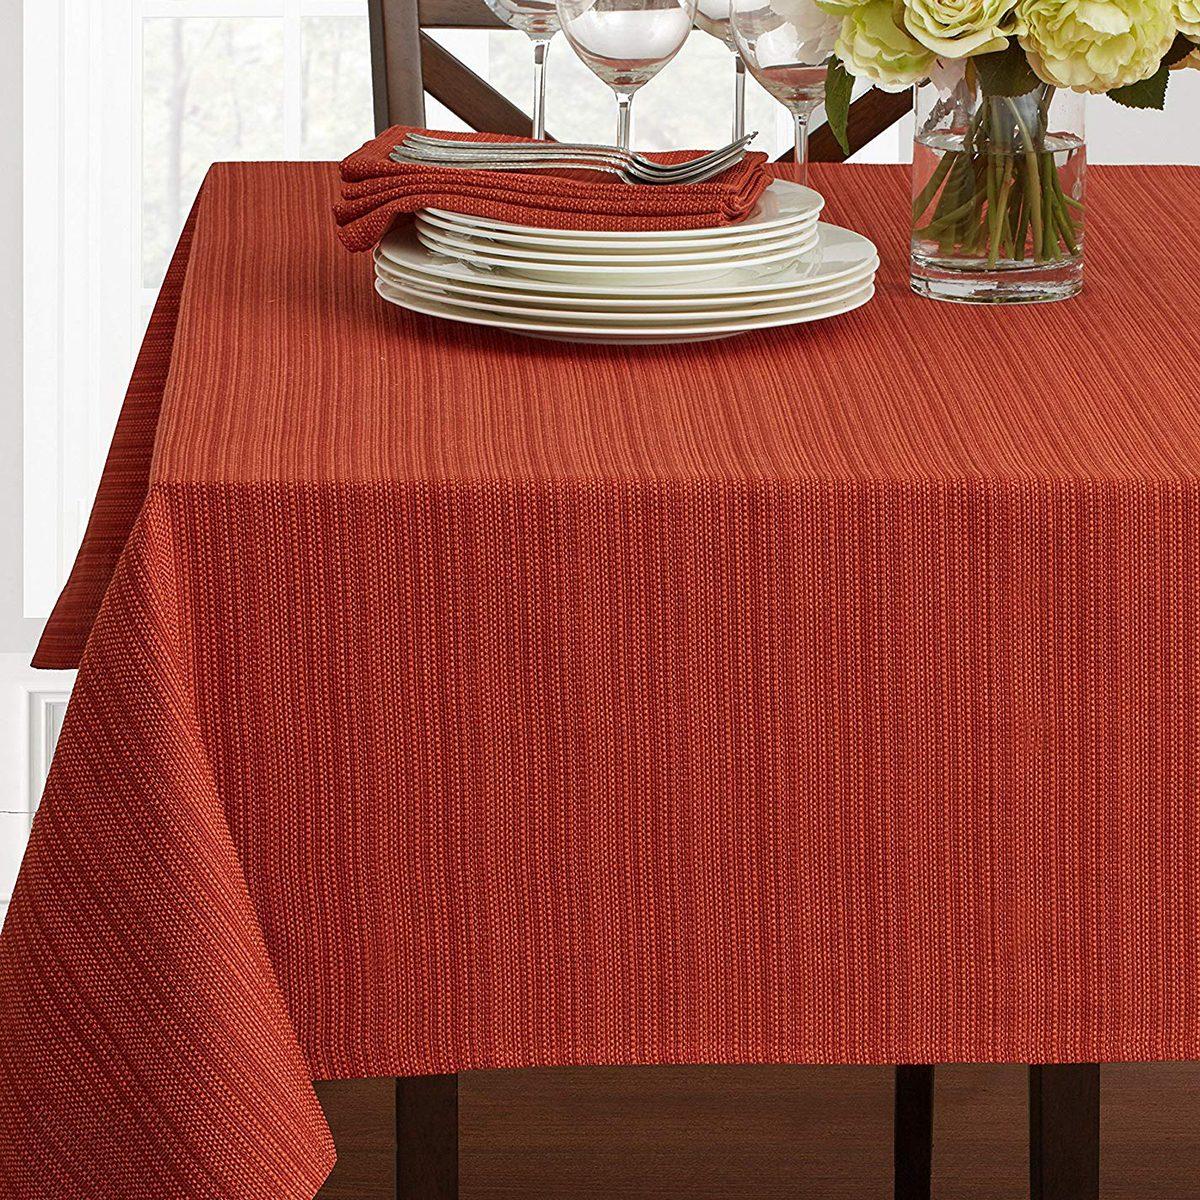 "Textured Fabric Tablecloth, Bison, 60"" x 104"" Rectangular"